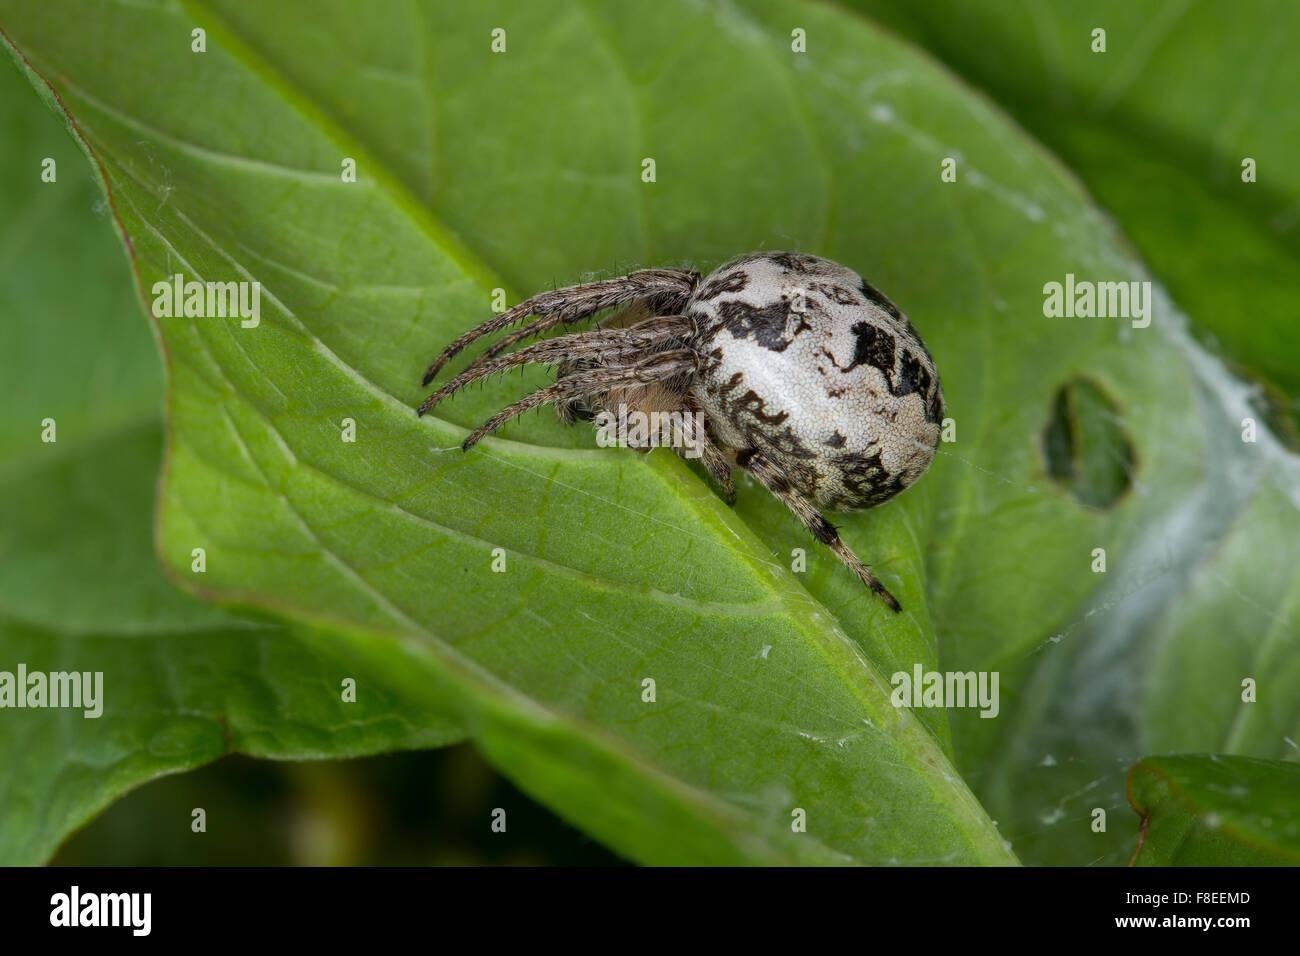 Furrow spider, Furrow Orbweaver Spider, Schilfradspinne, Schildkreuzspinne, Larinioides cornutus, Araneus cornutus - Stock Image